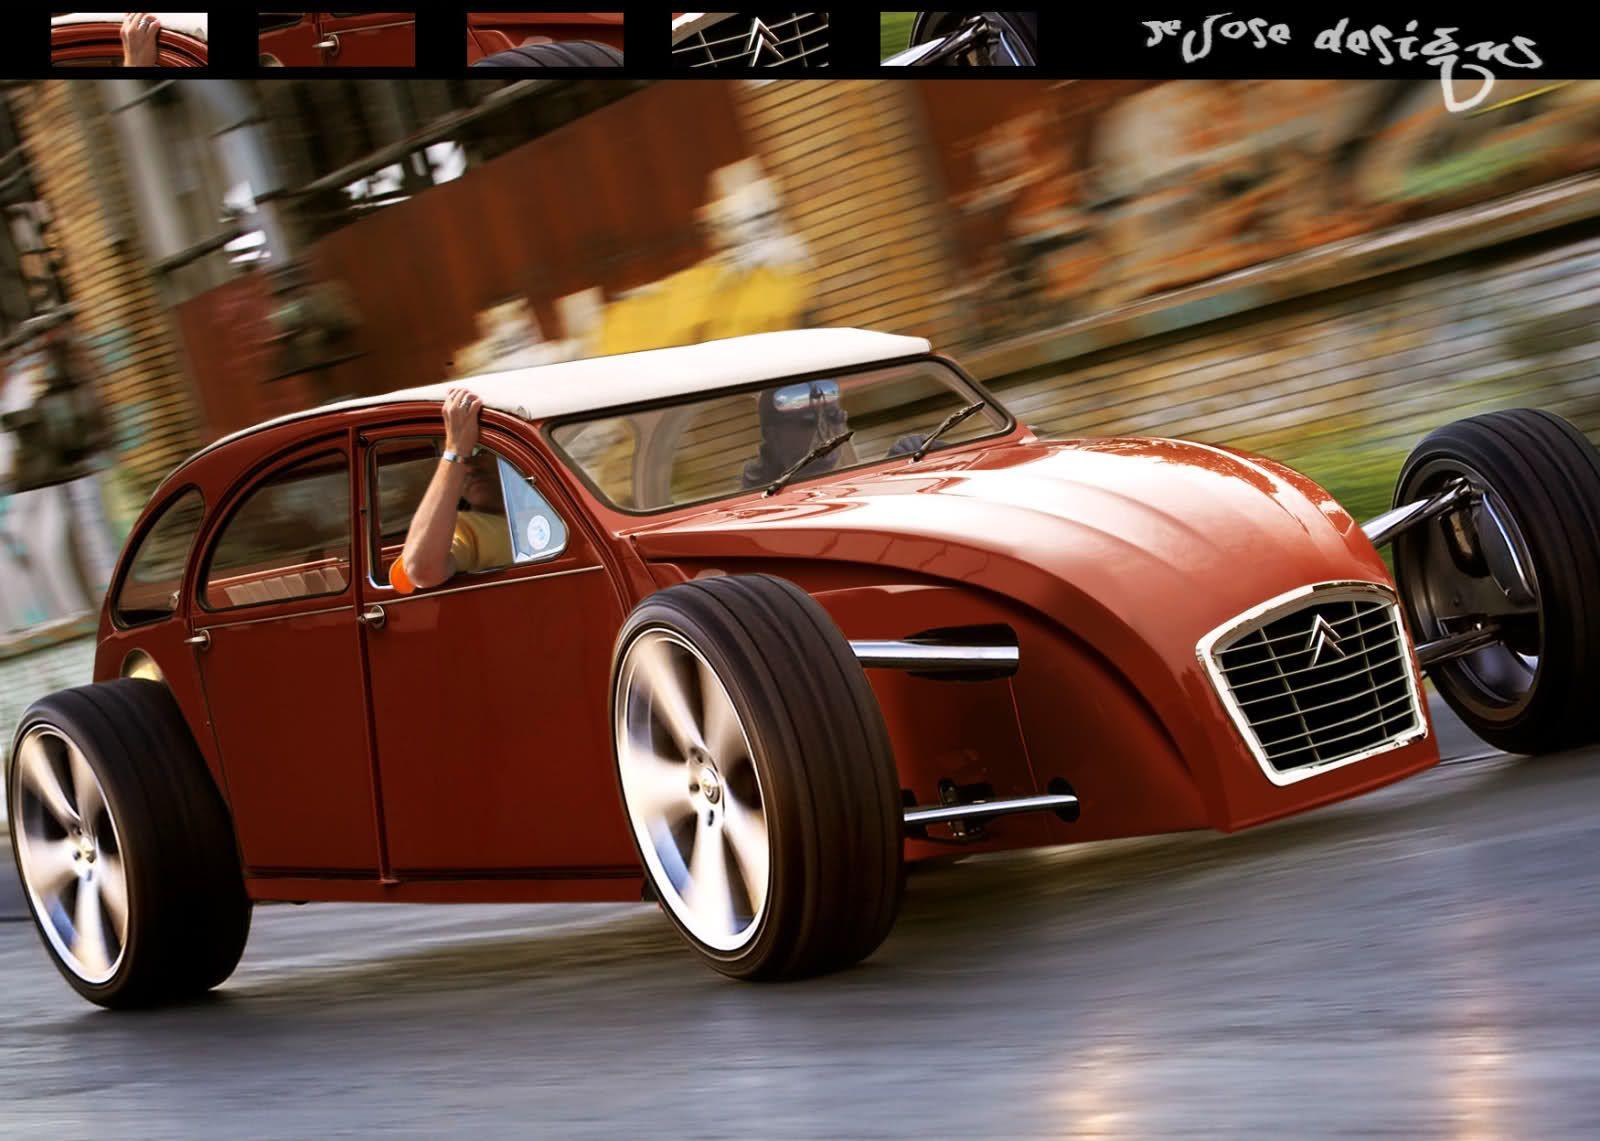 2cv hot rod recherche google tuning pinterest 2cv voitures et belle voiture. Black Bedroom Furniture Sets. Home Design Ideas